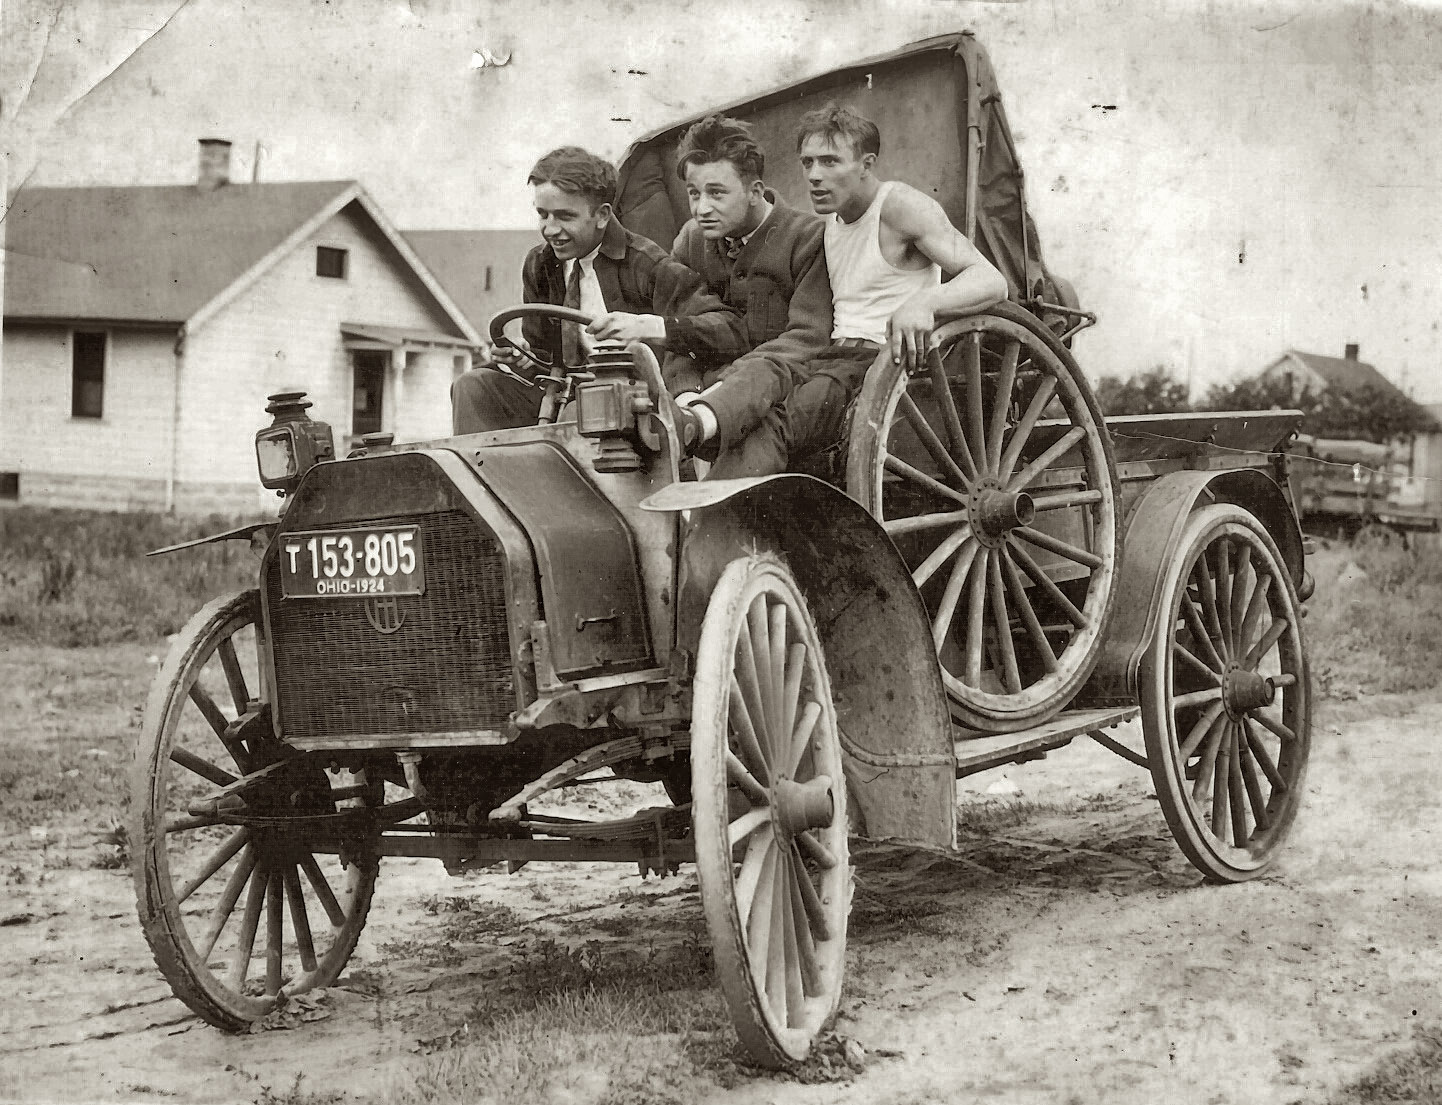 1924 three friends take a joyride